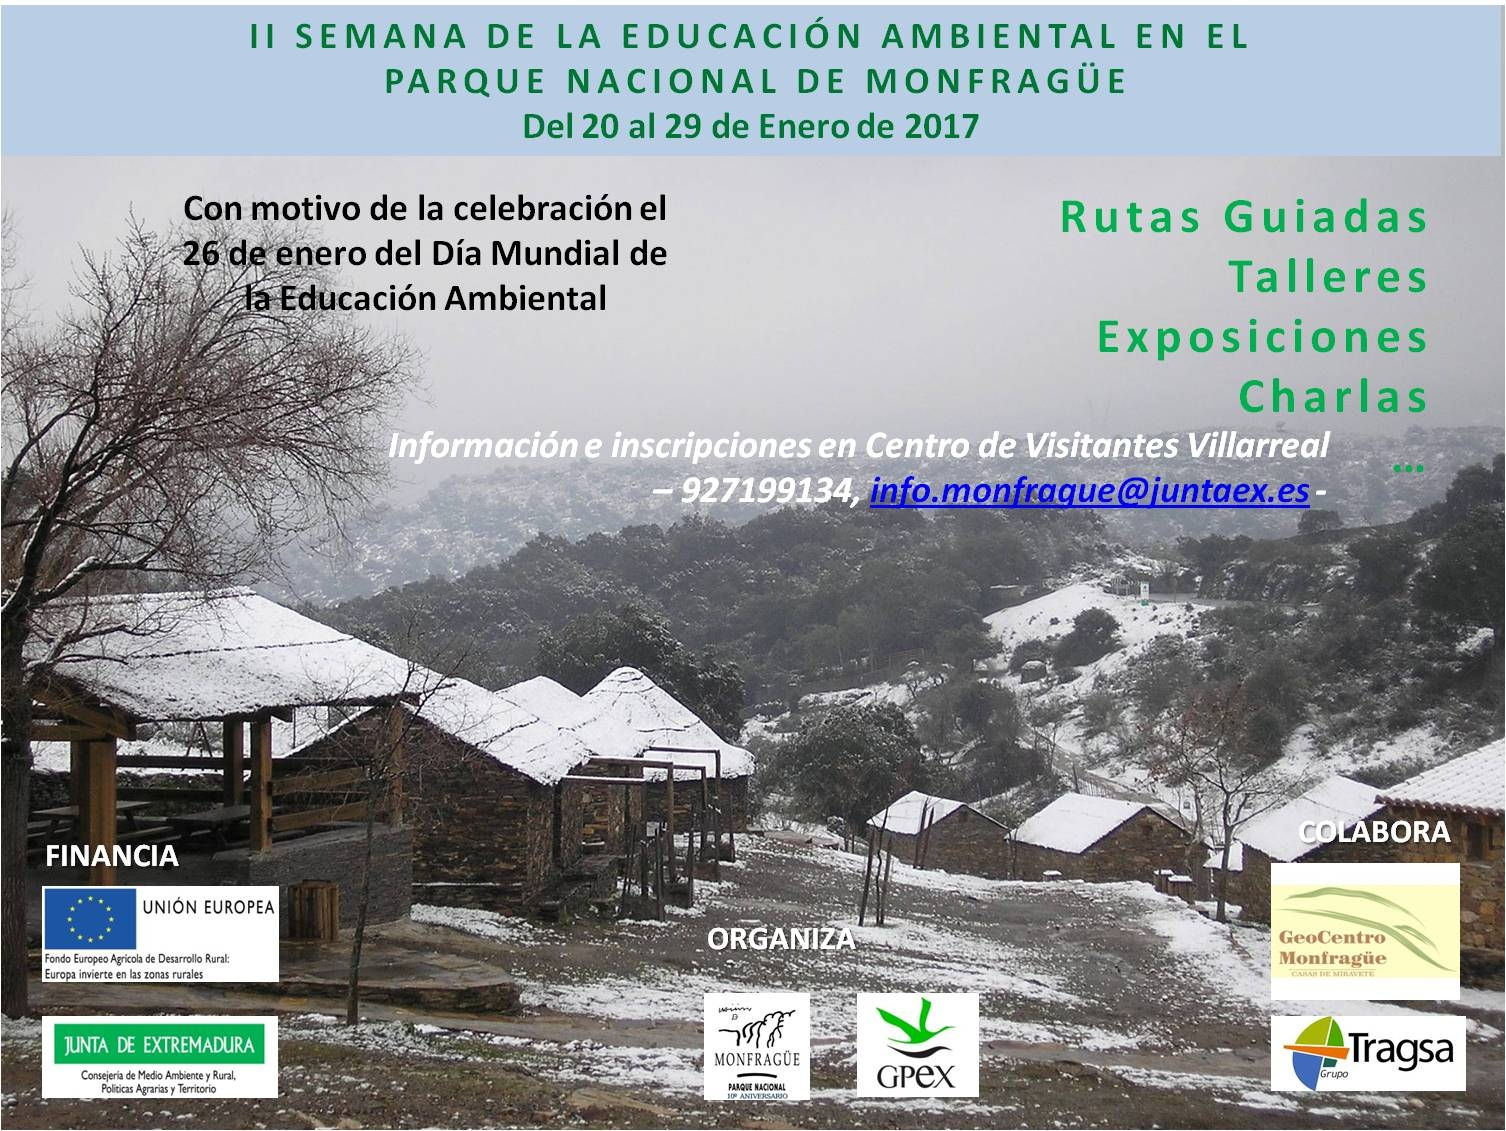 Casa rural del corral parque nacional de monfrag e ii semana educaci n ambiental - Casa rural monfrague ...